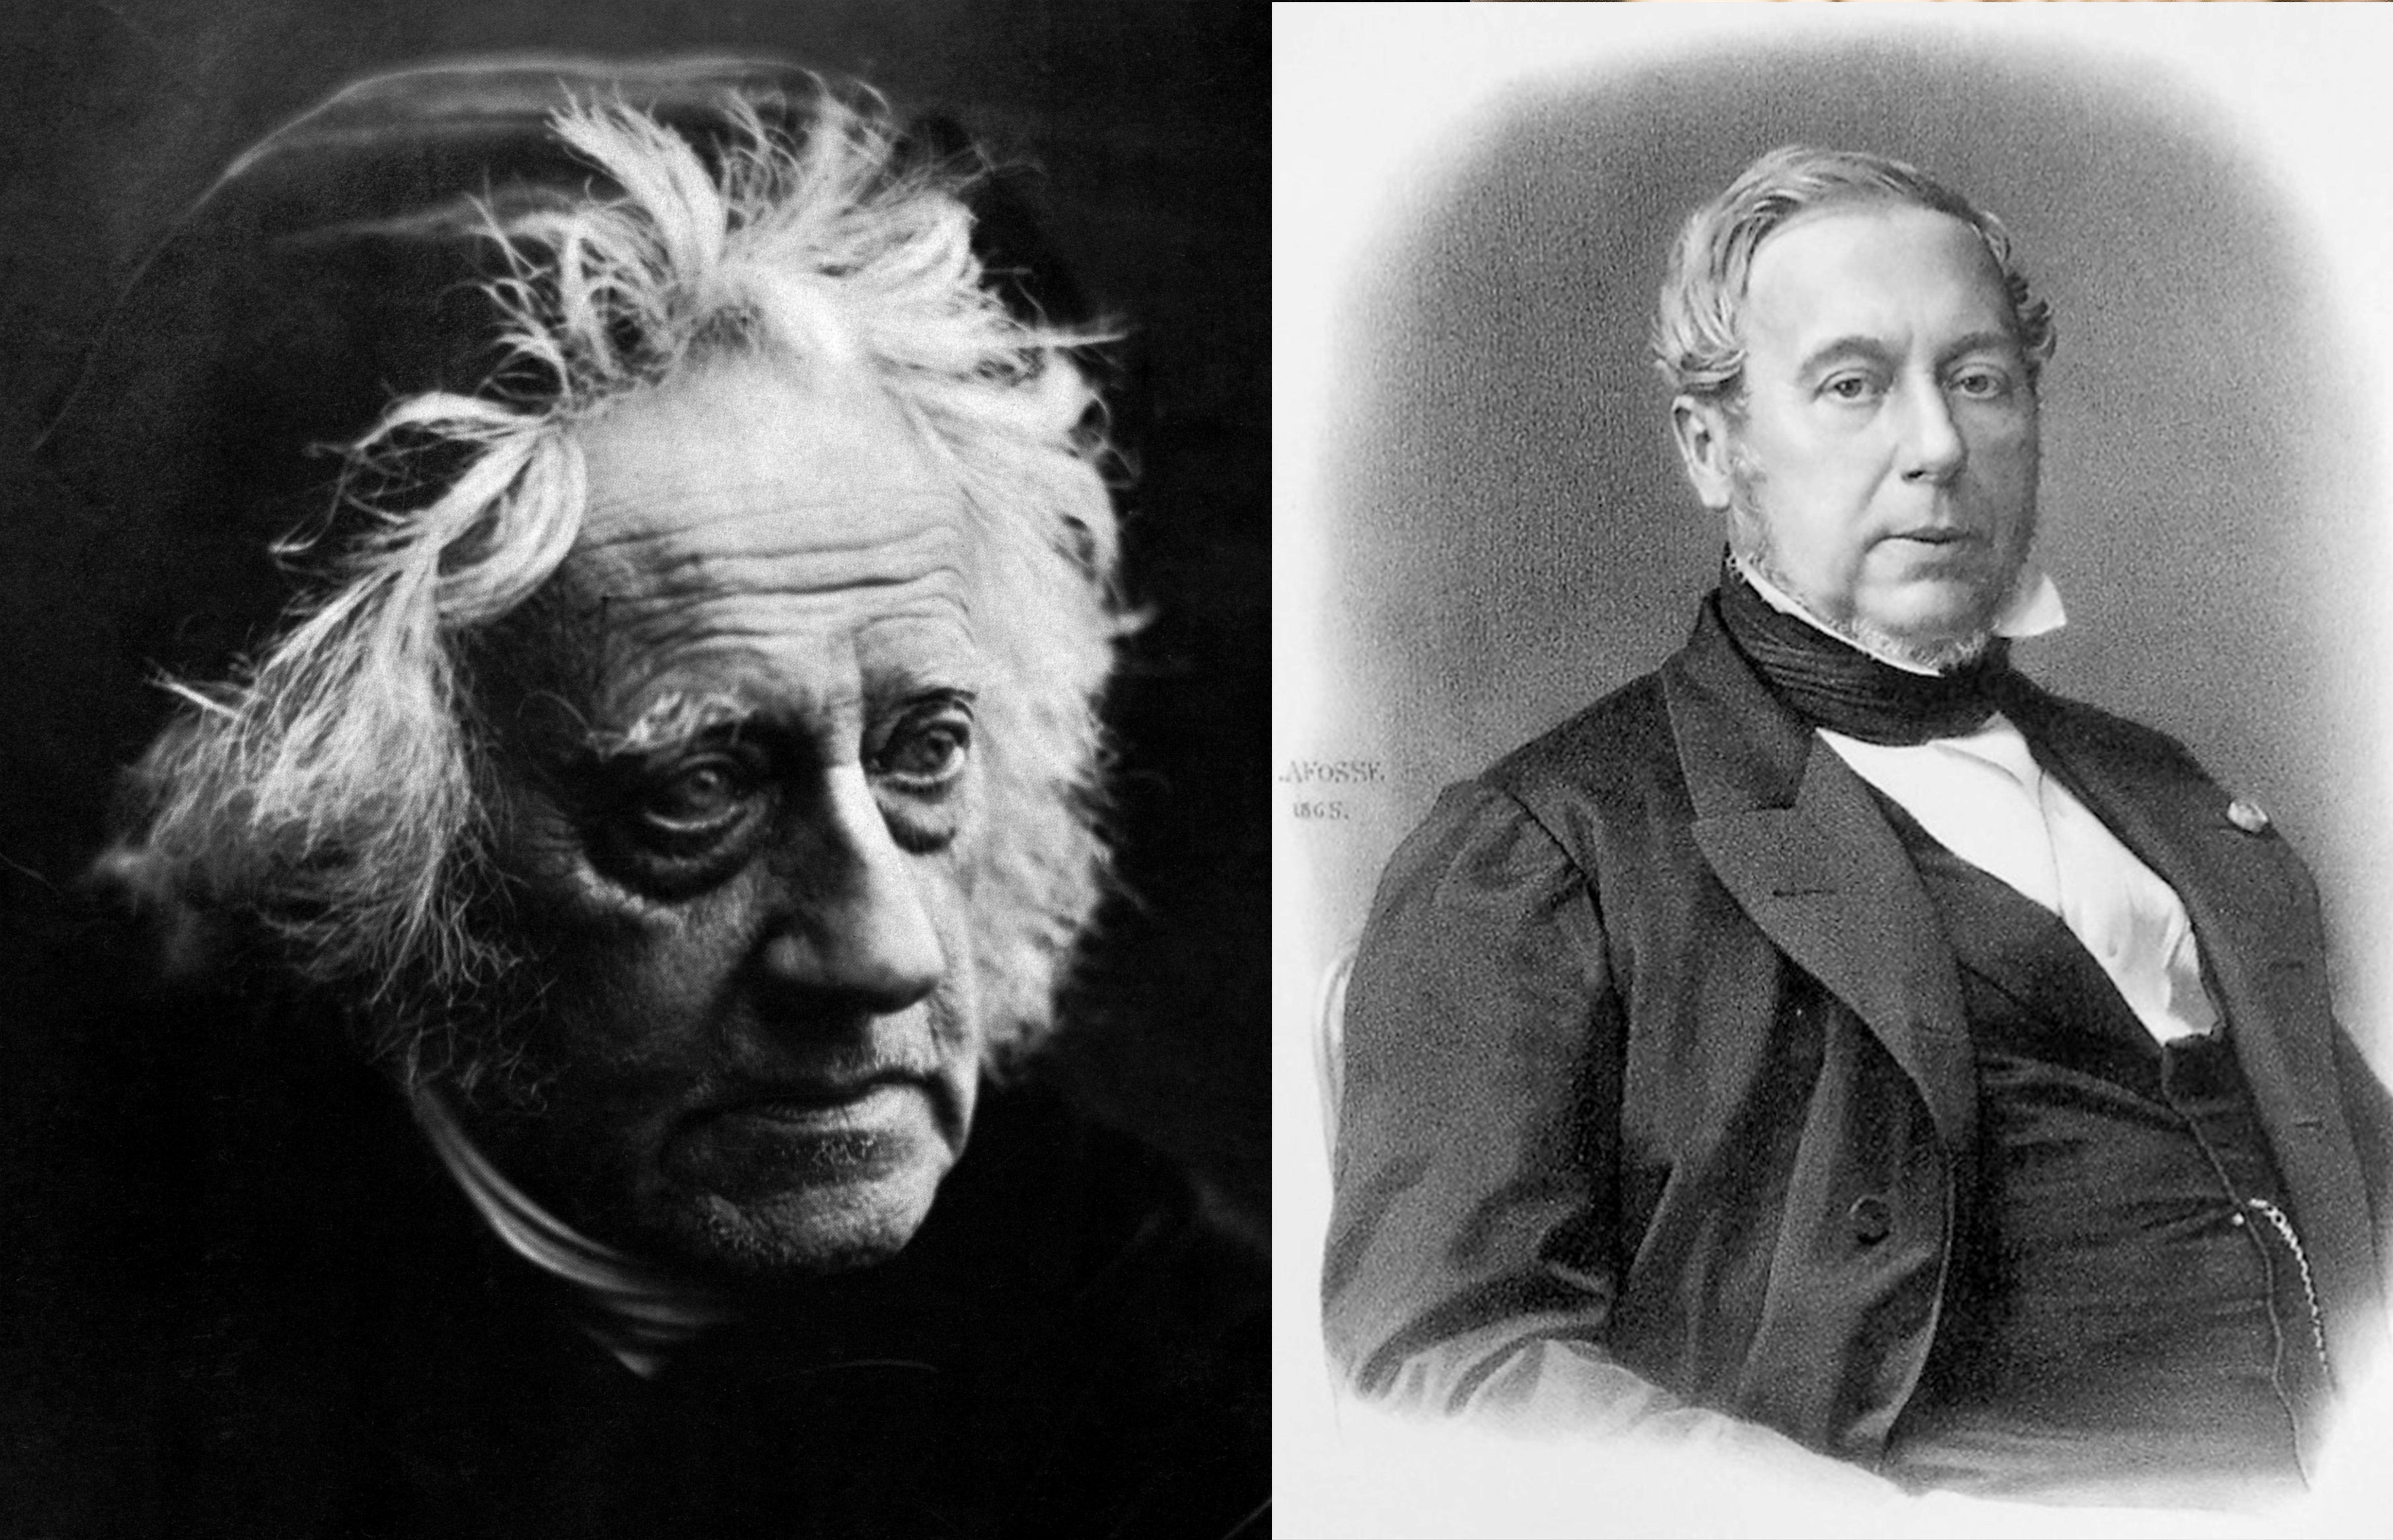 John Herschel - William Herschel